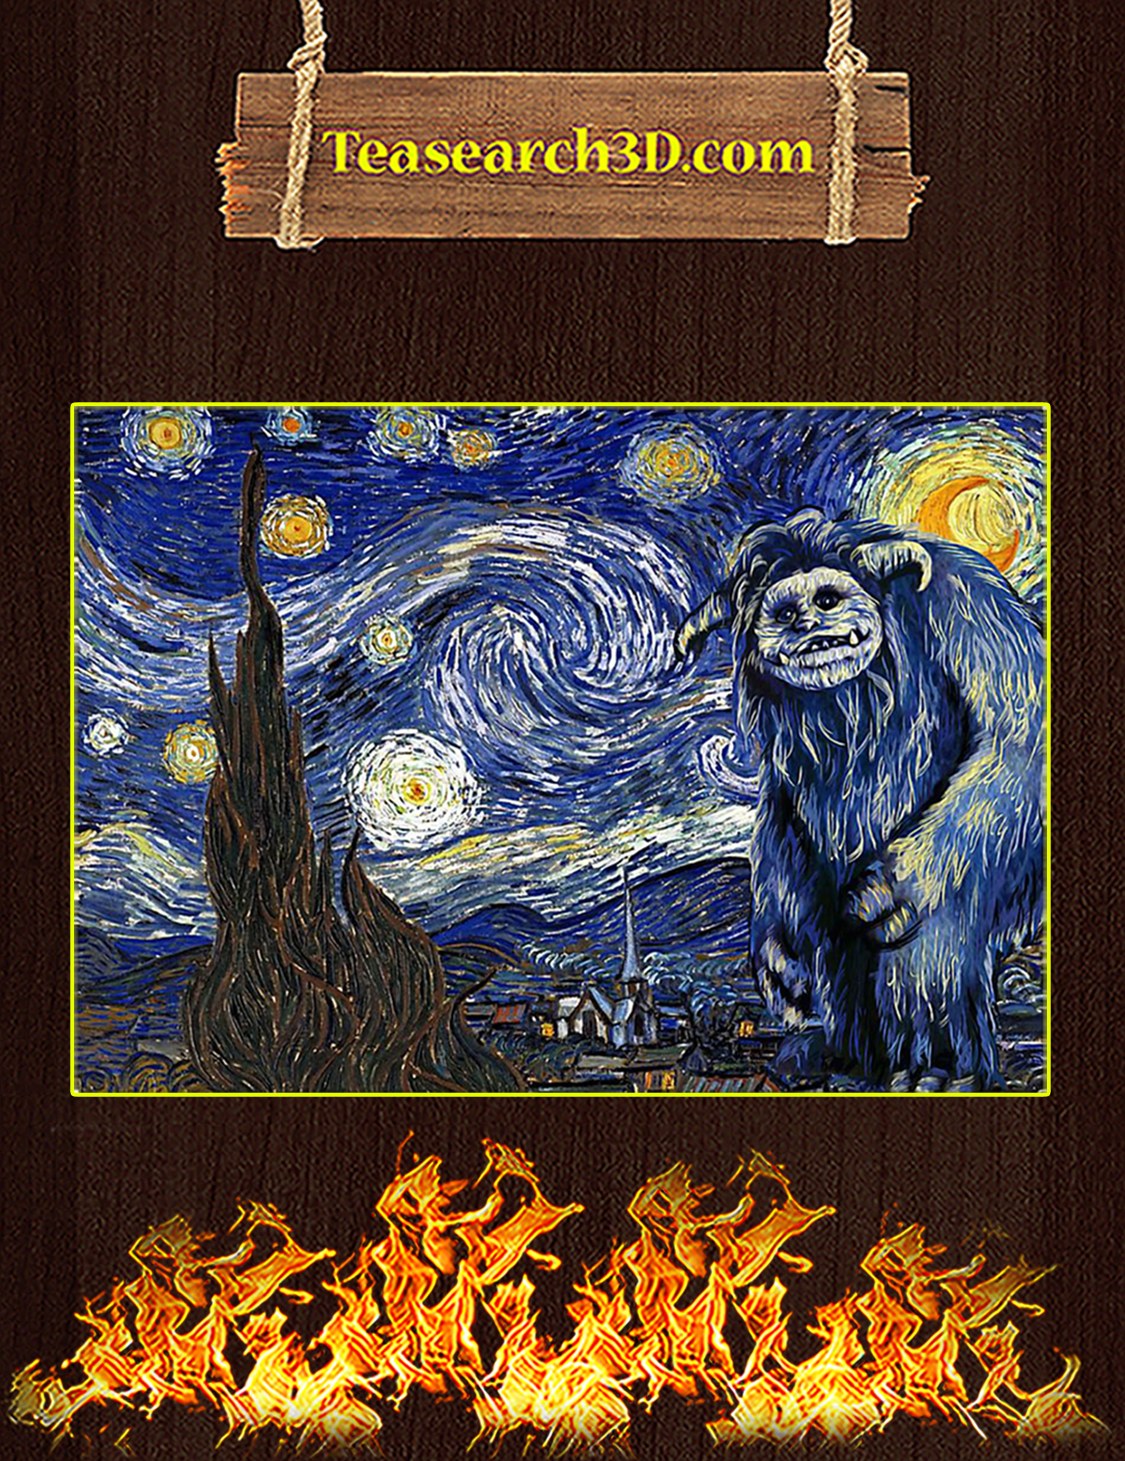 Labyrinth ludo starry night van gogh poster A3